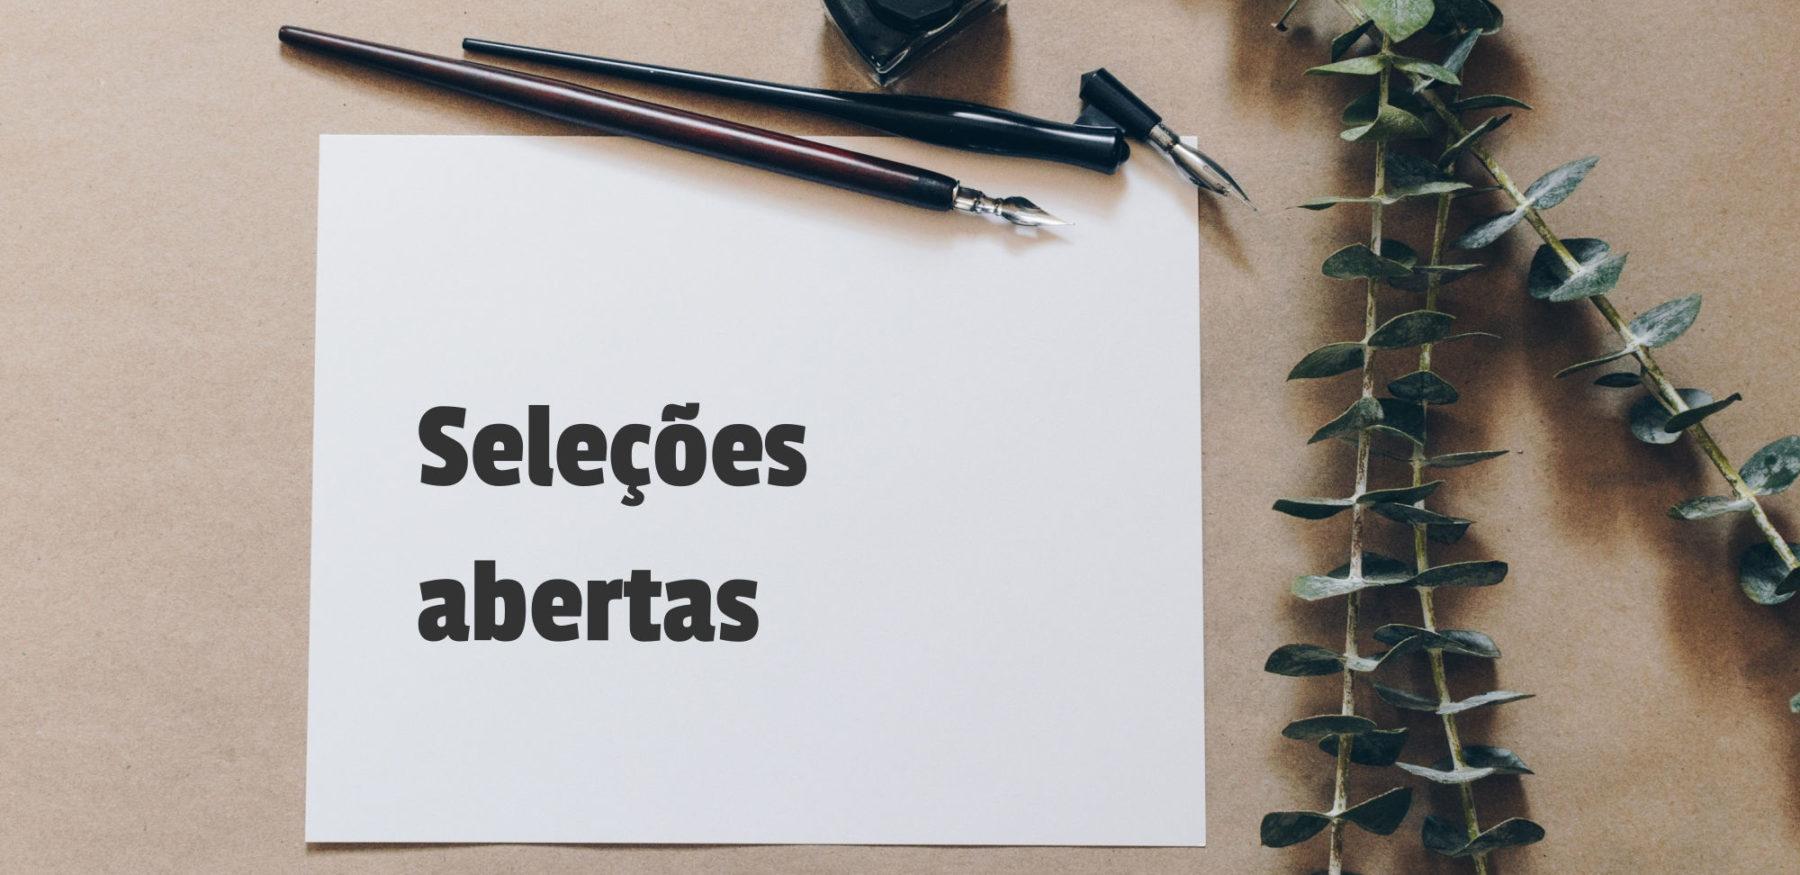 Selecoes aberta para Mecanico de Frota Analista Manutencao Eletricista Coordenador de PCP 1800x875 - Seleções aberta para Mecânico de Frota, Analista Manutenção, Eletricista Coordenador de PCP.